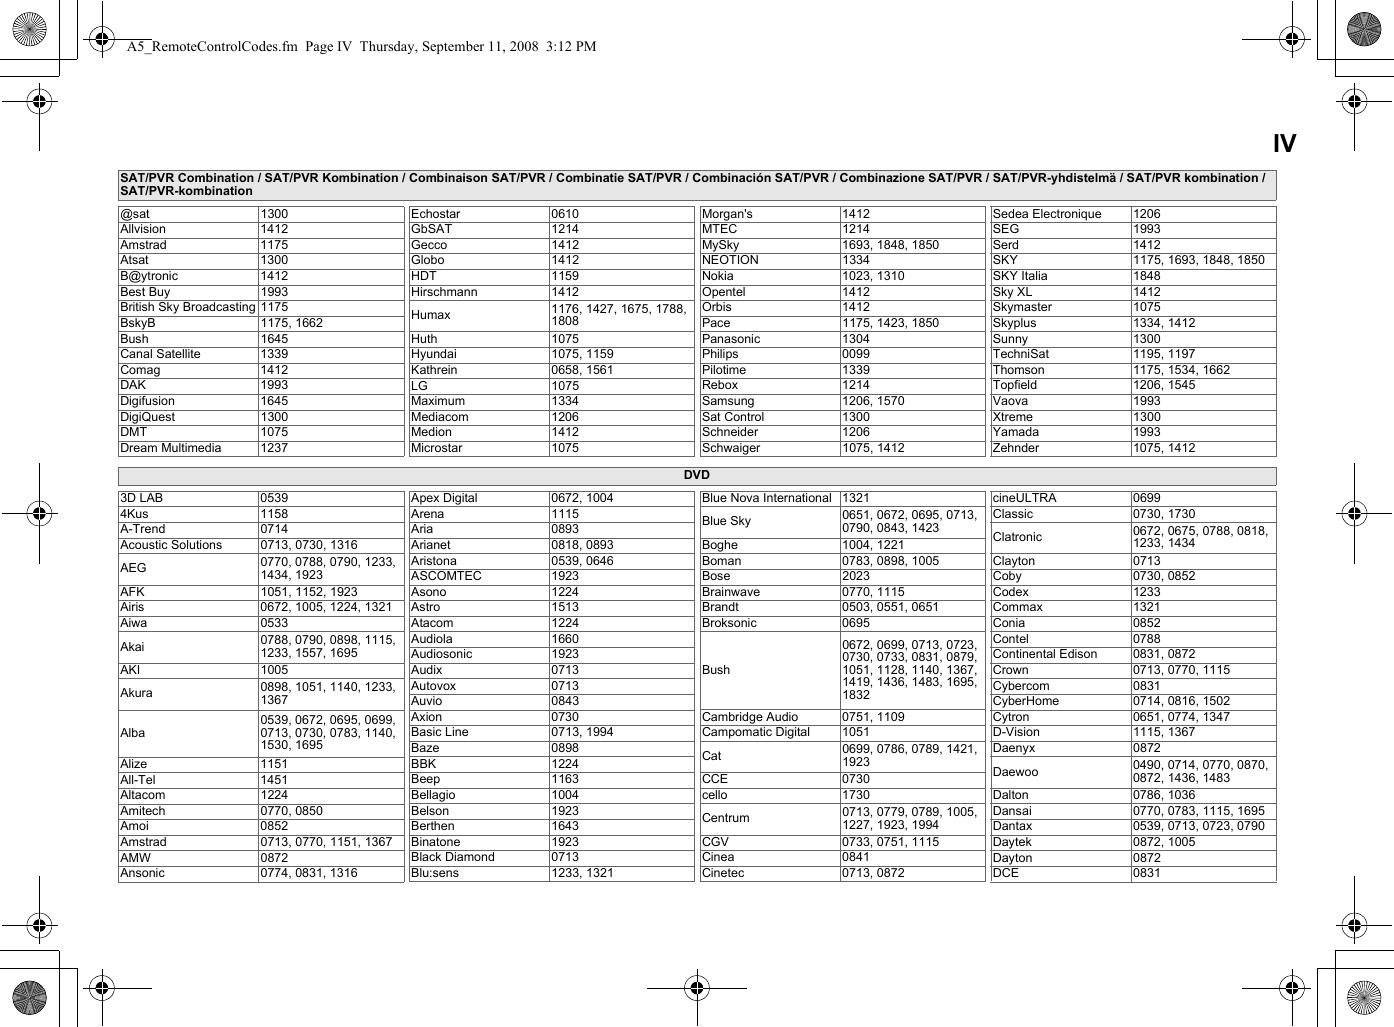 Aeg Favorit 251 I Bedienungsanleitung